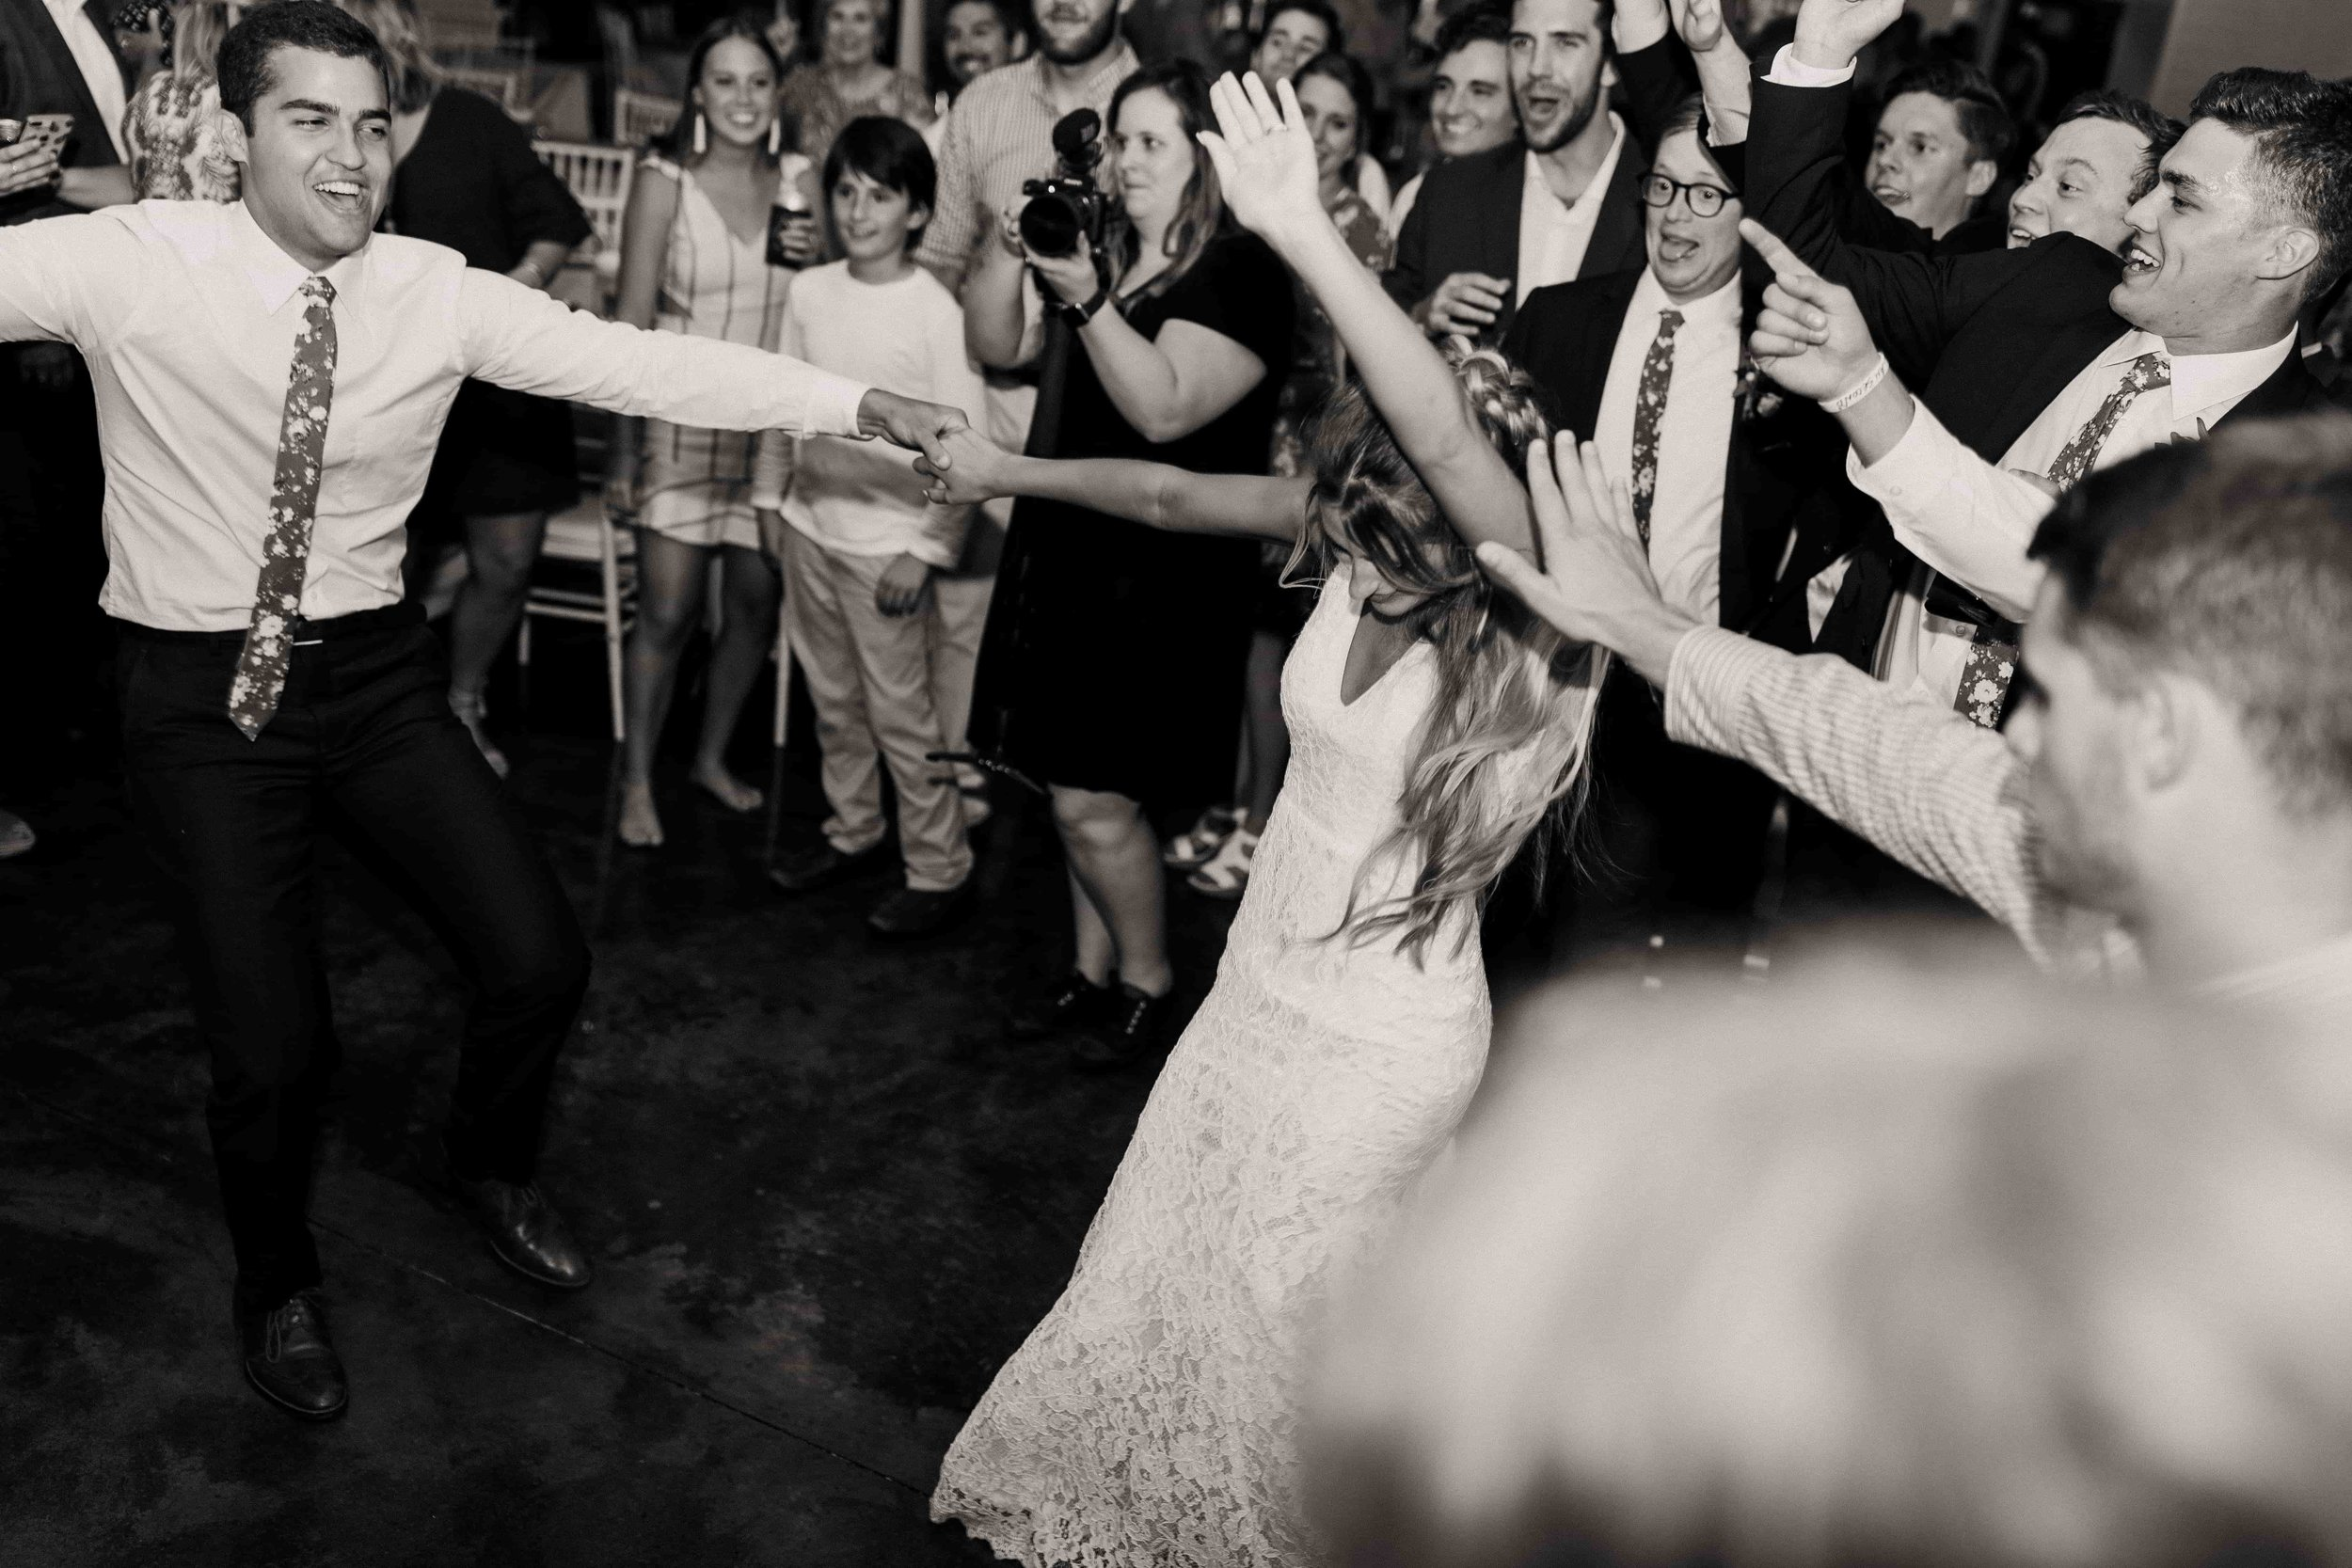 dancing tulsa wedding venue 2-min.jpg